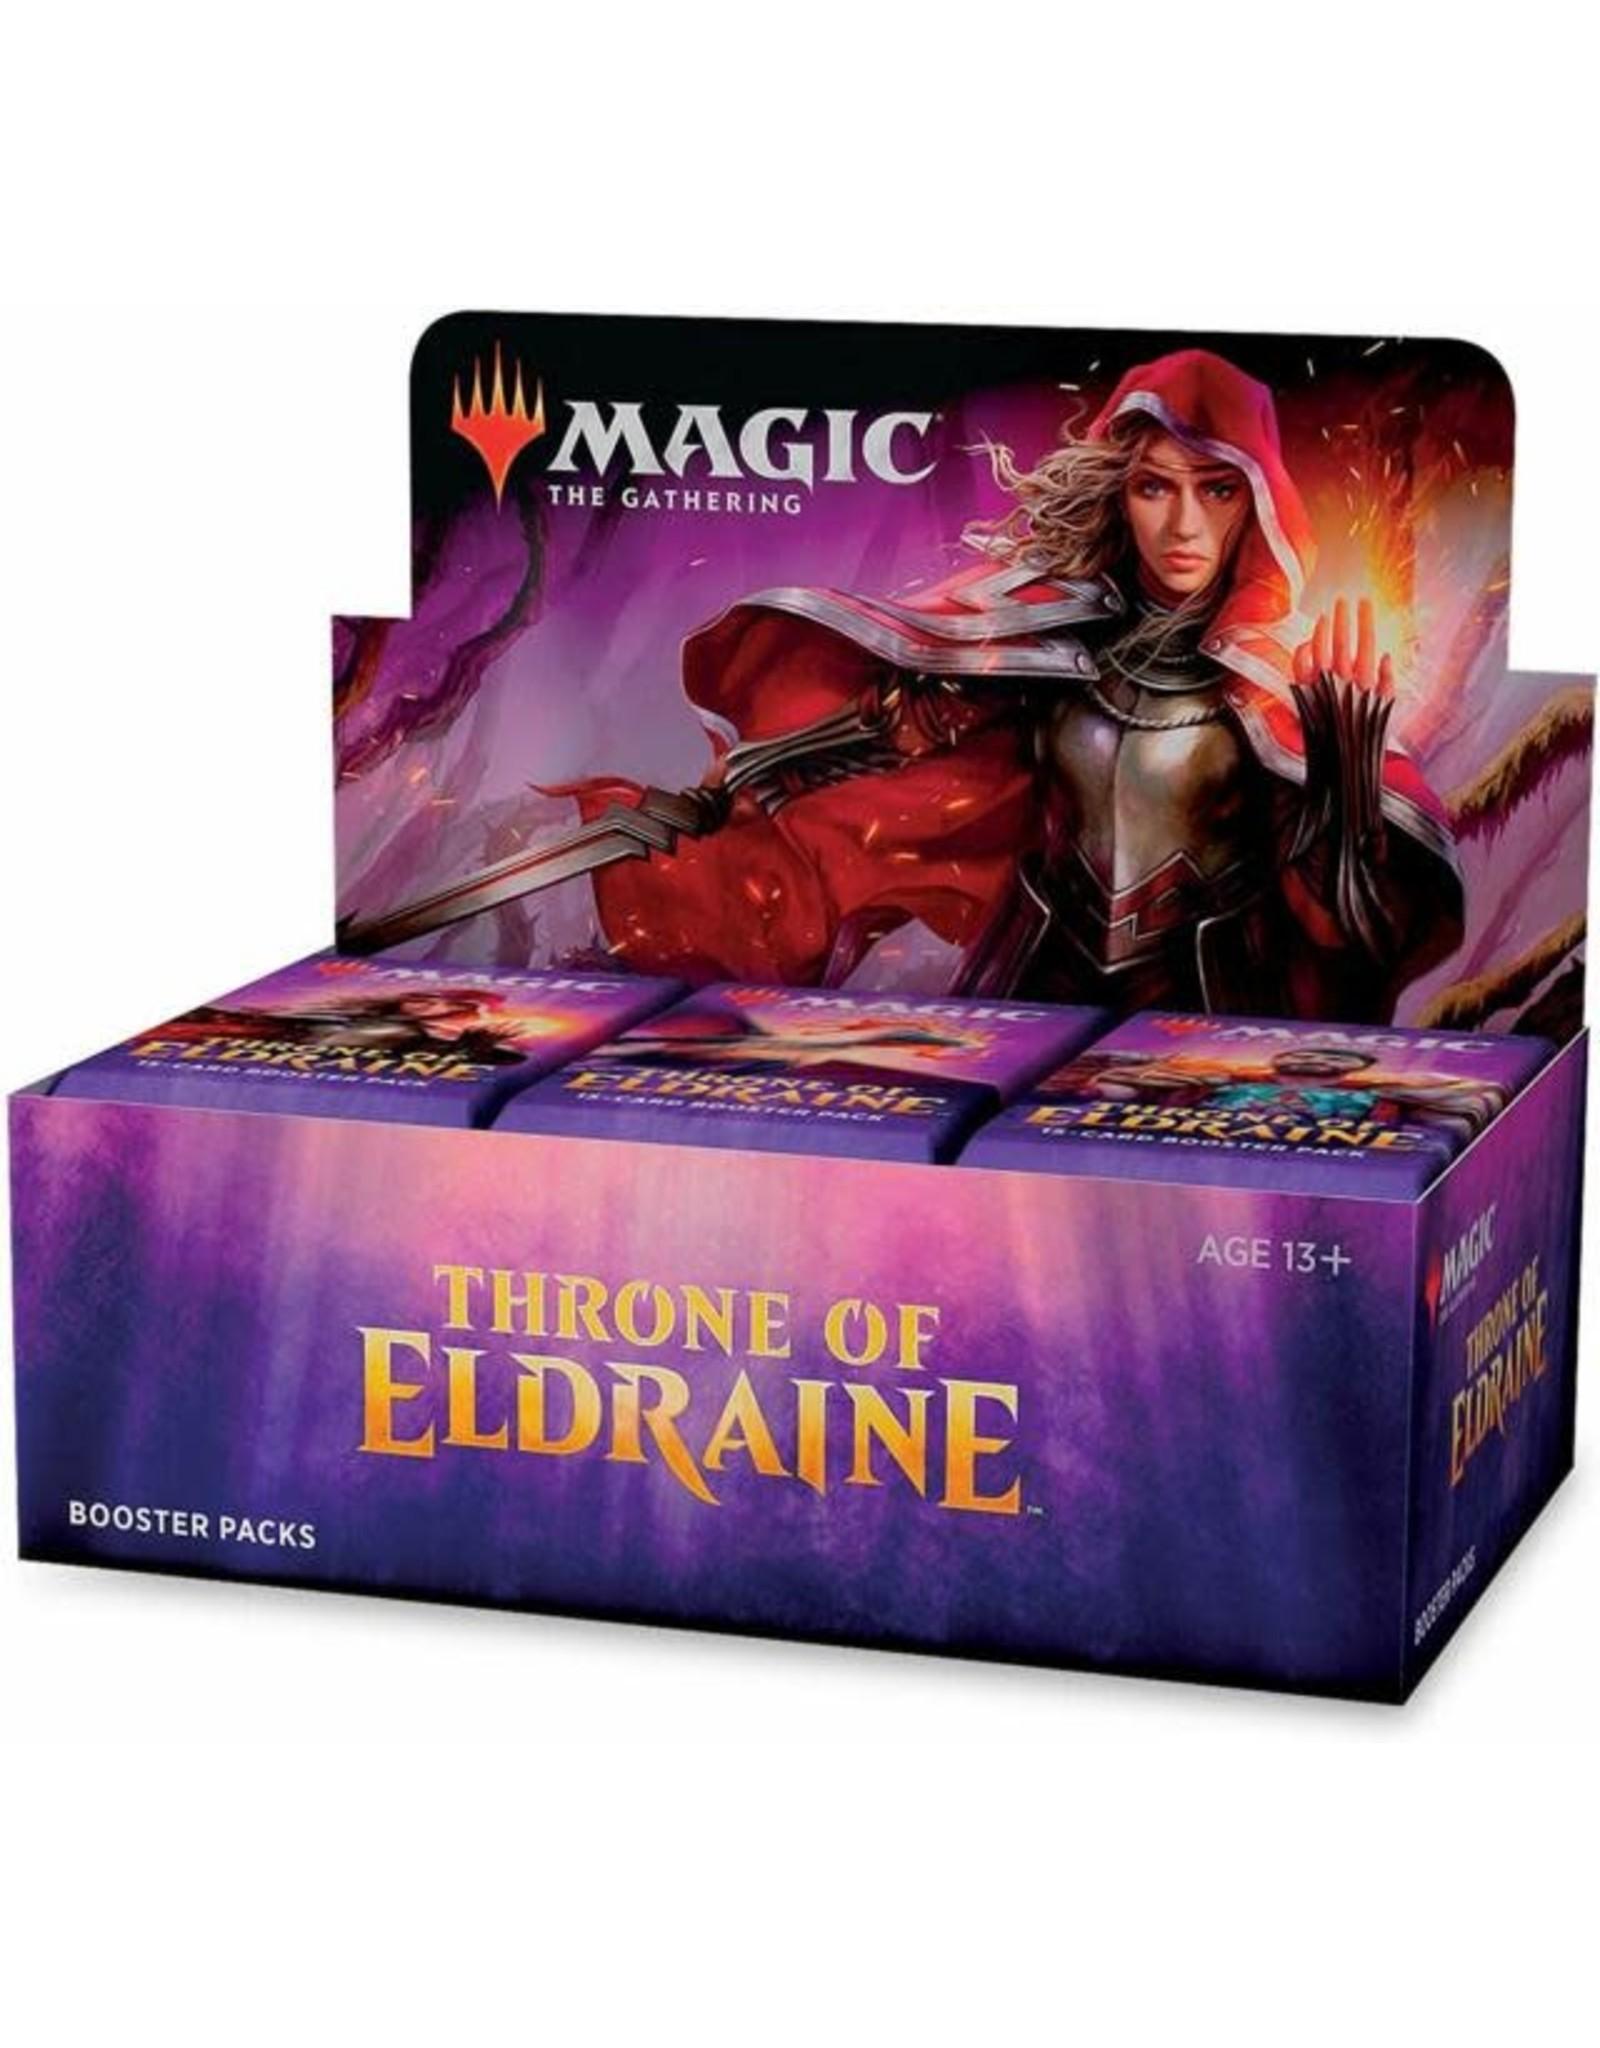 Magic: The Gathering Throne of Eldraine Booster Box